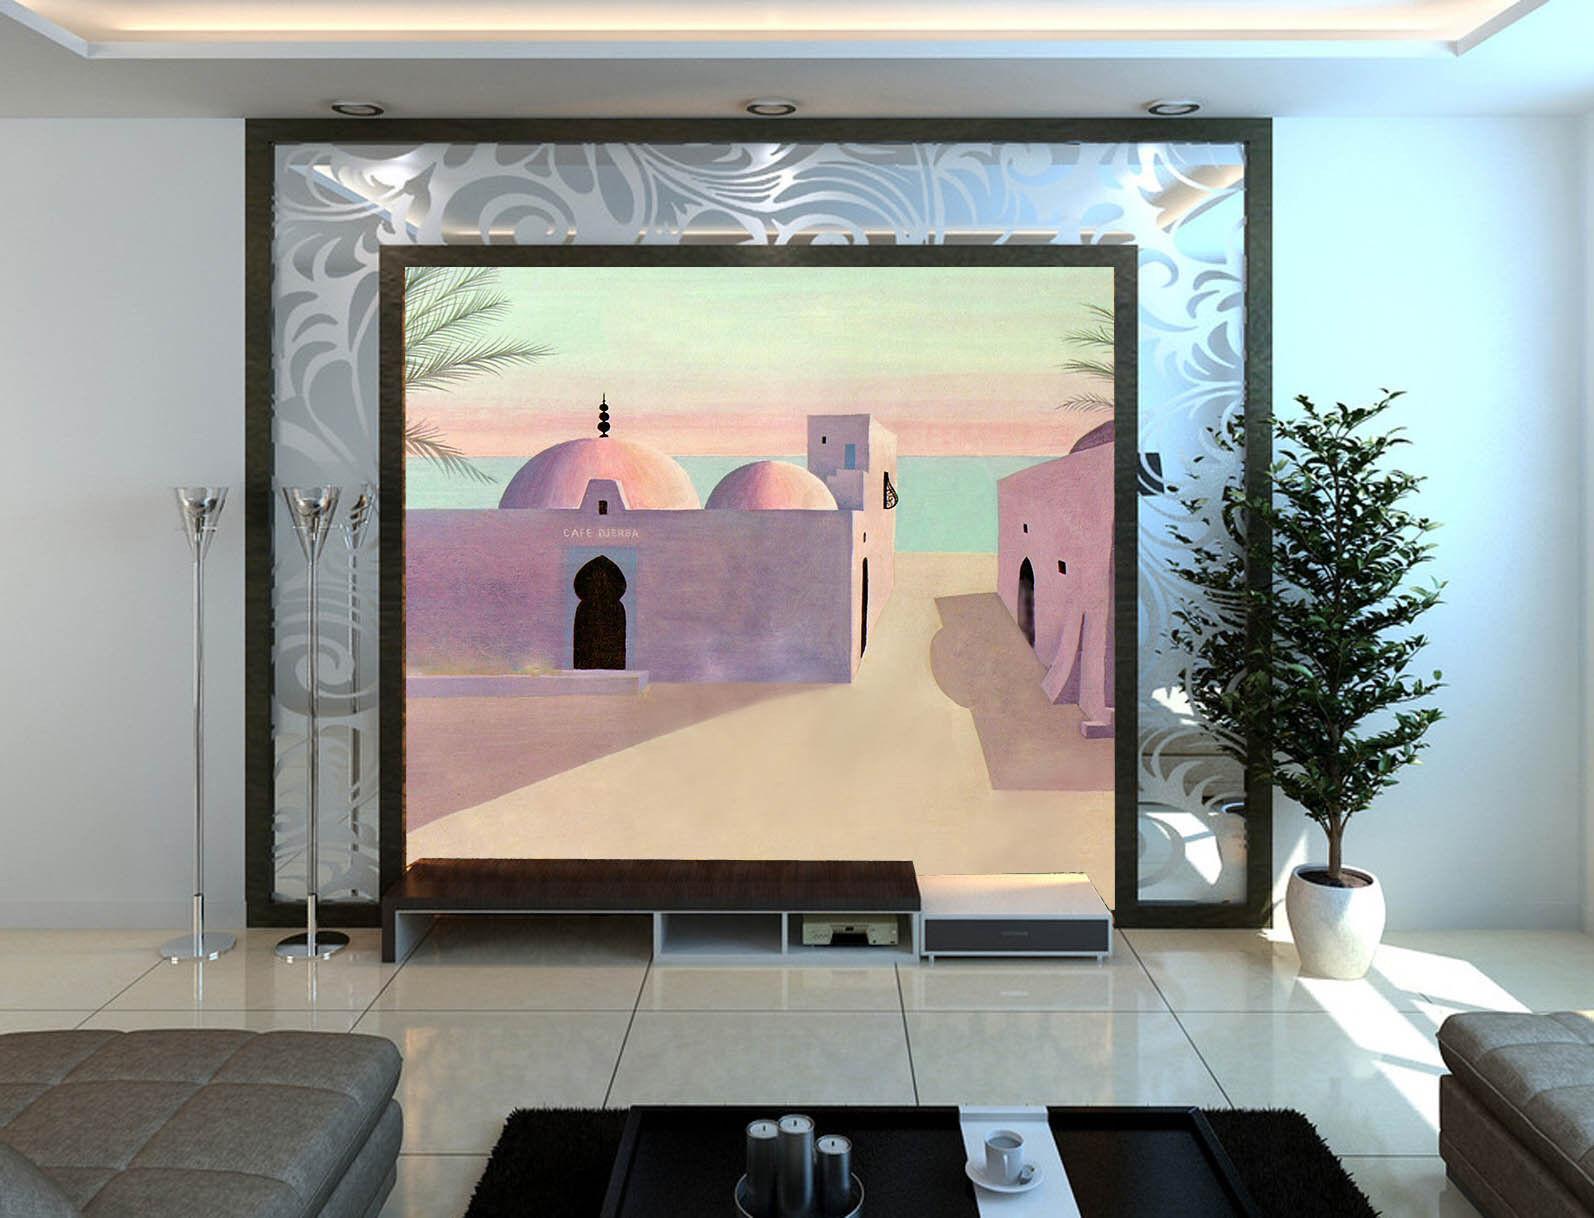 3D Porpora Cabina Parete Murale Foto Carta da parati immagine sfondo muro stampa